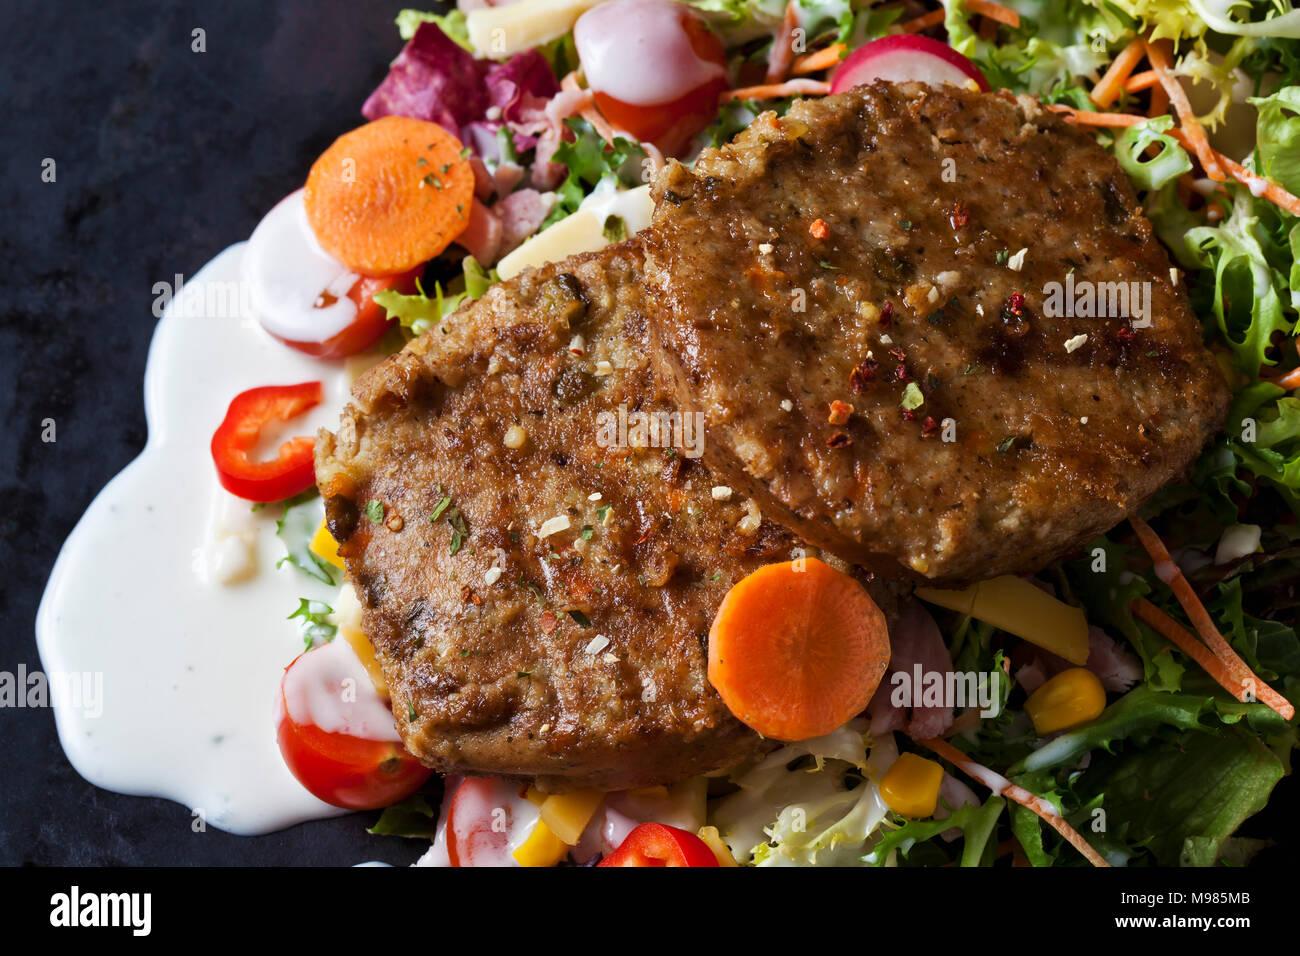 Veggie burger con lechuga, verduras y salsa de yogur Imagen De Stock